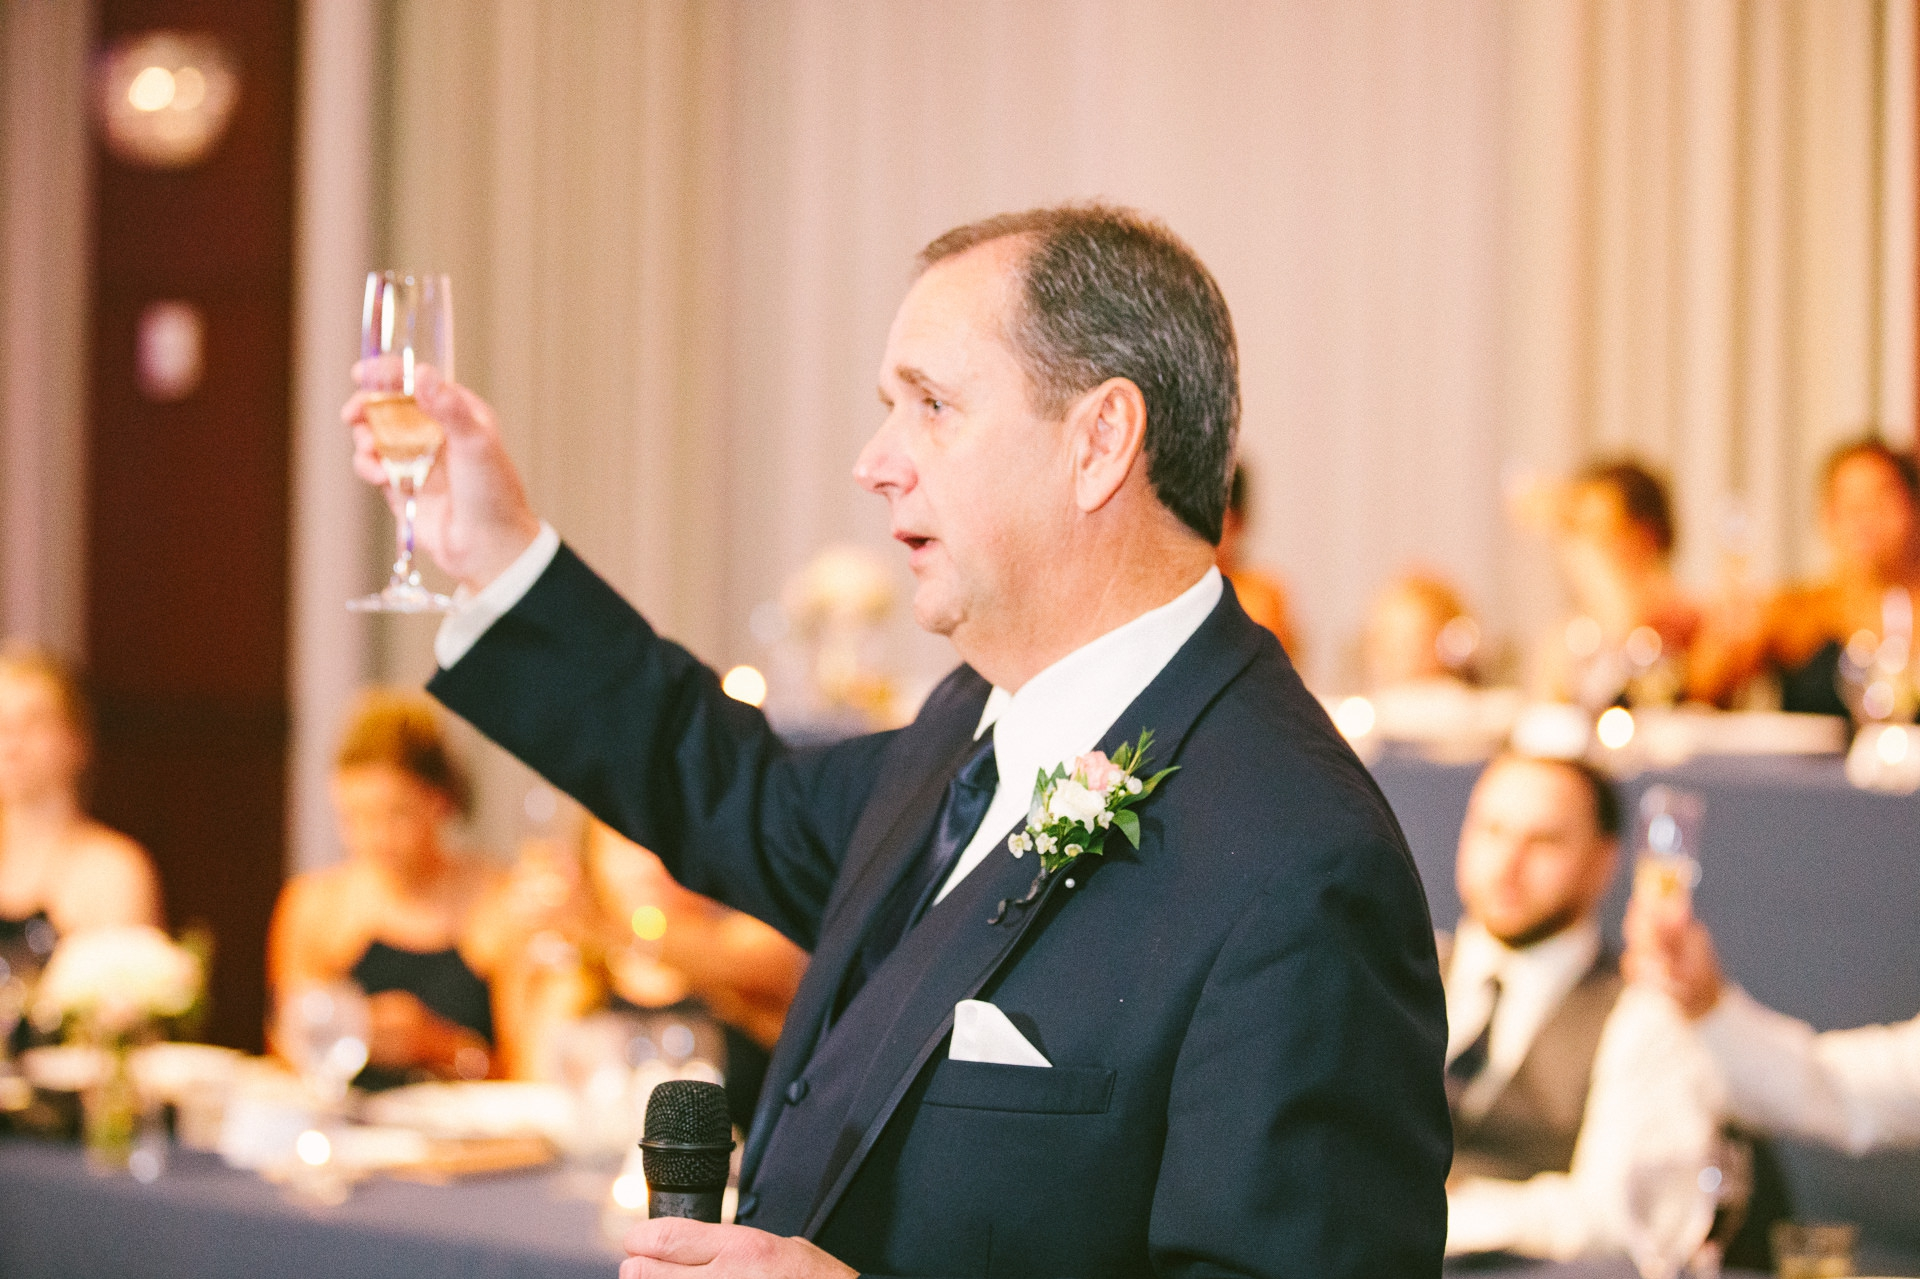 Intercontinental Hotel Wedding in Cleveland 2 35.jpg